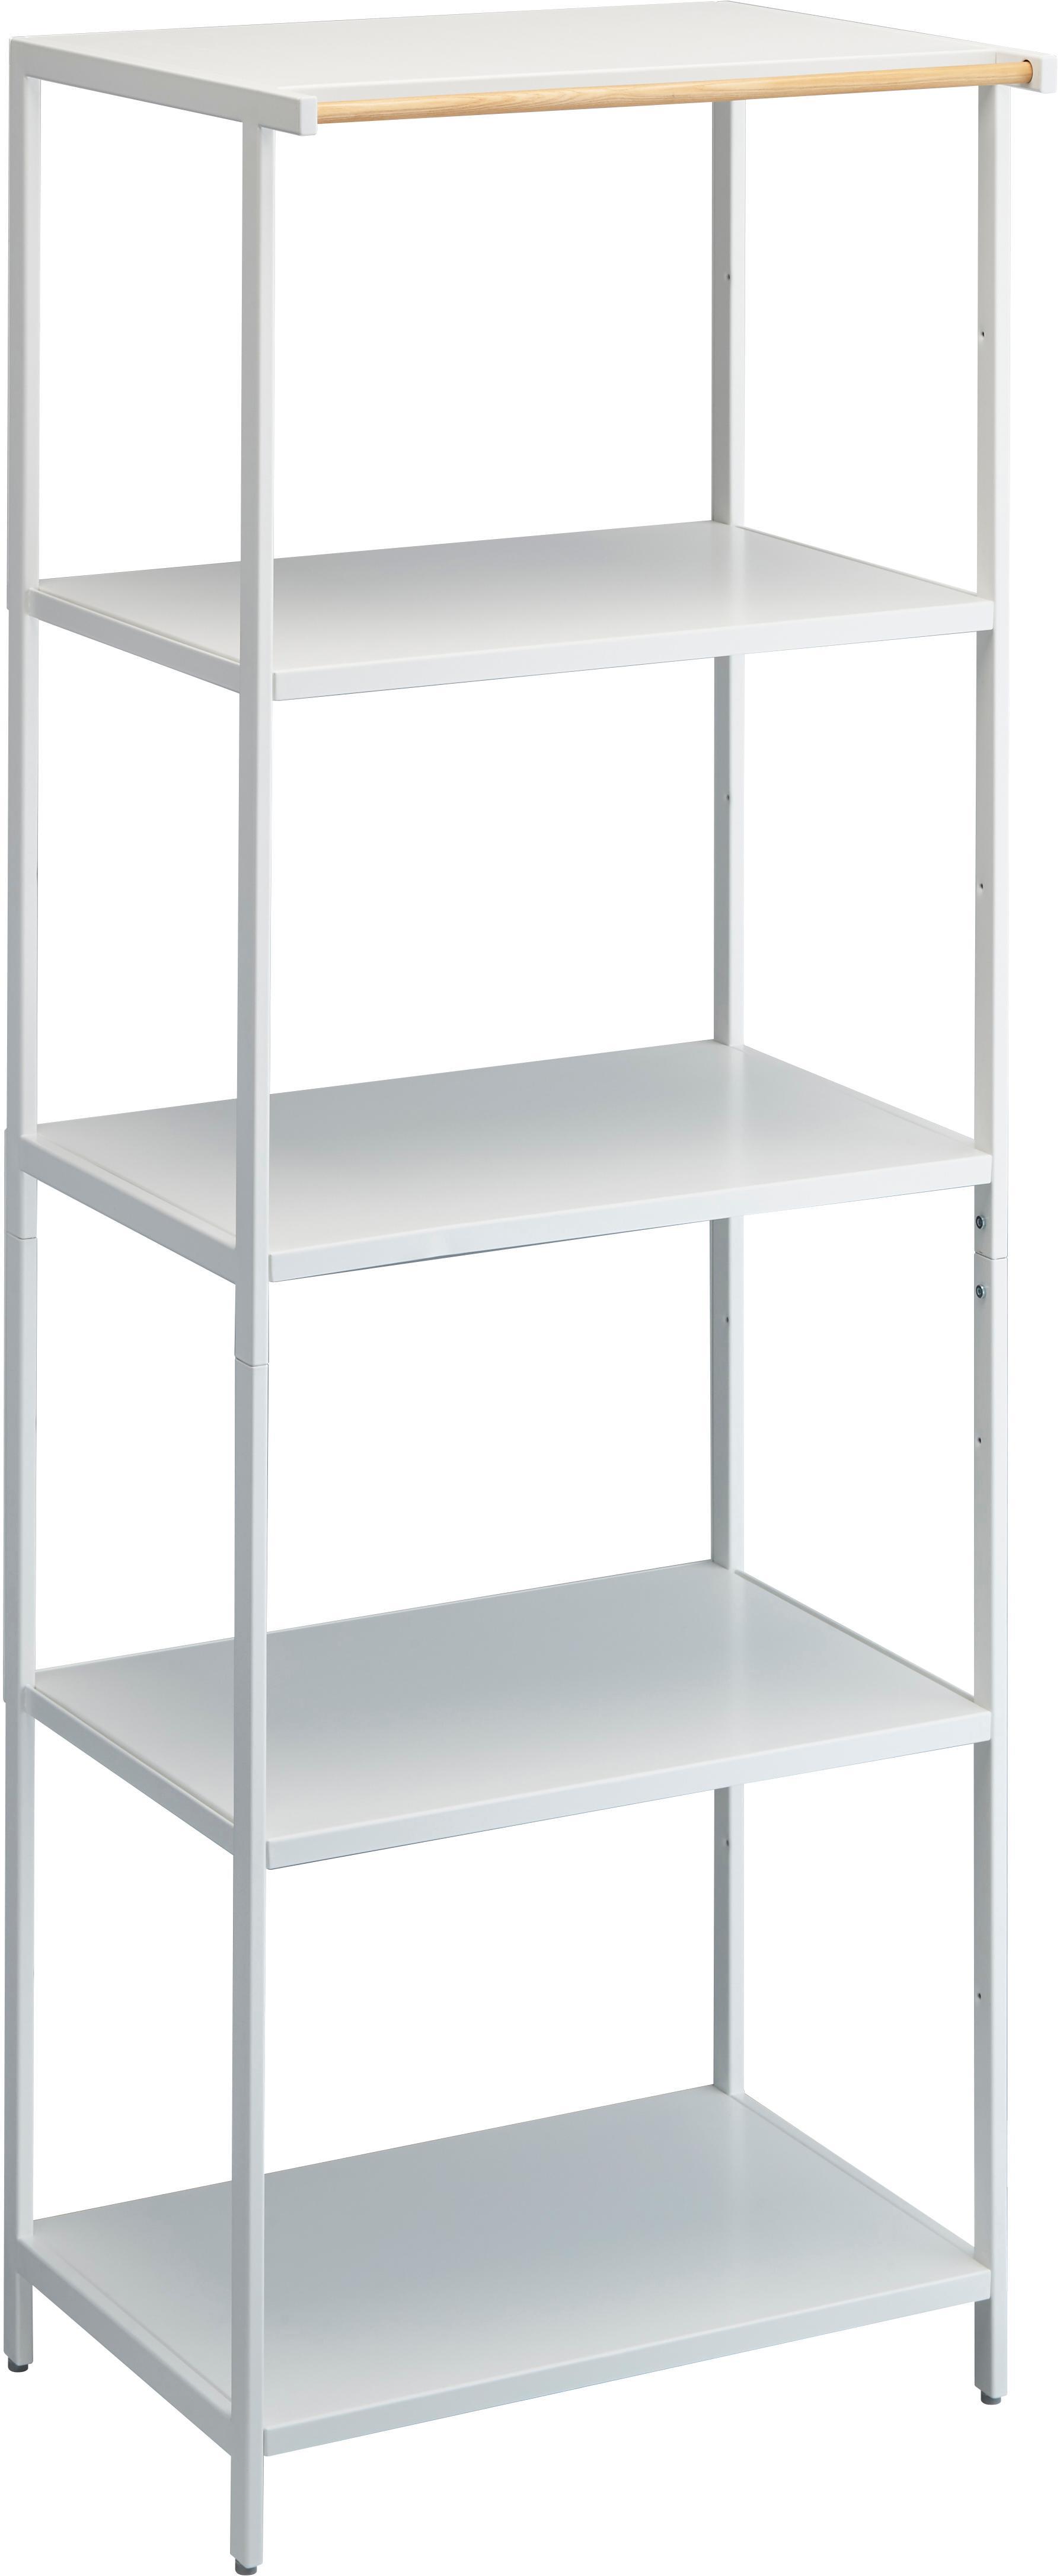 Libreria in metallo bianco Killy, Manico: legno, Bianco, Larg. 60 x Alt. 170 cm